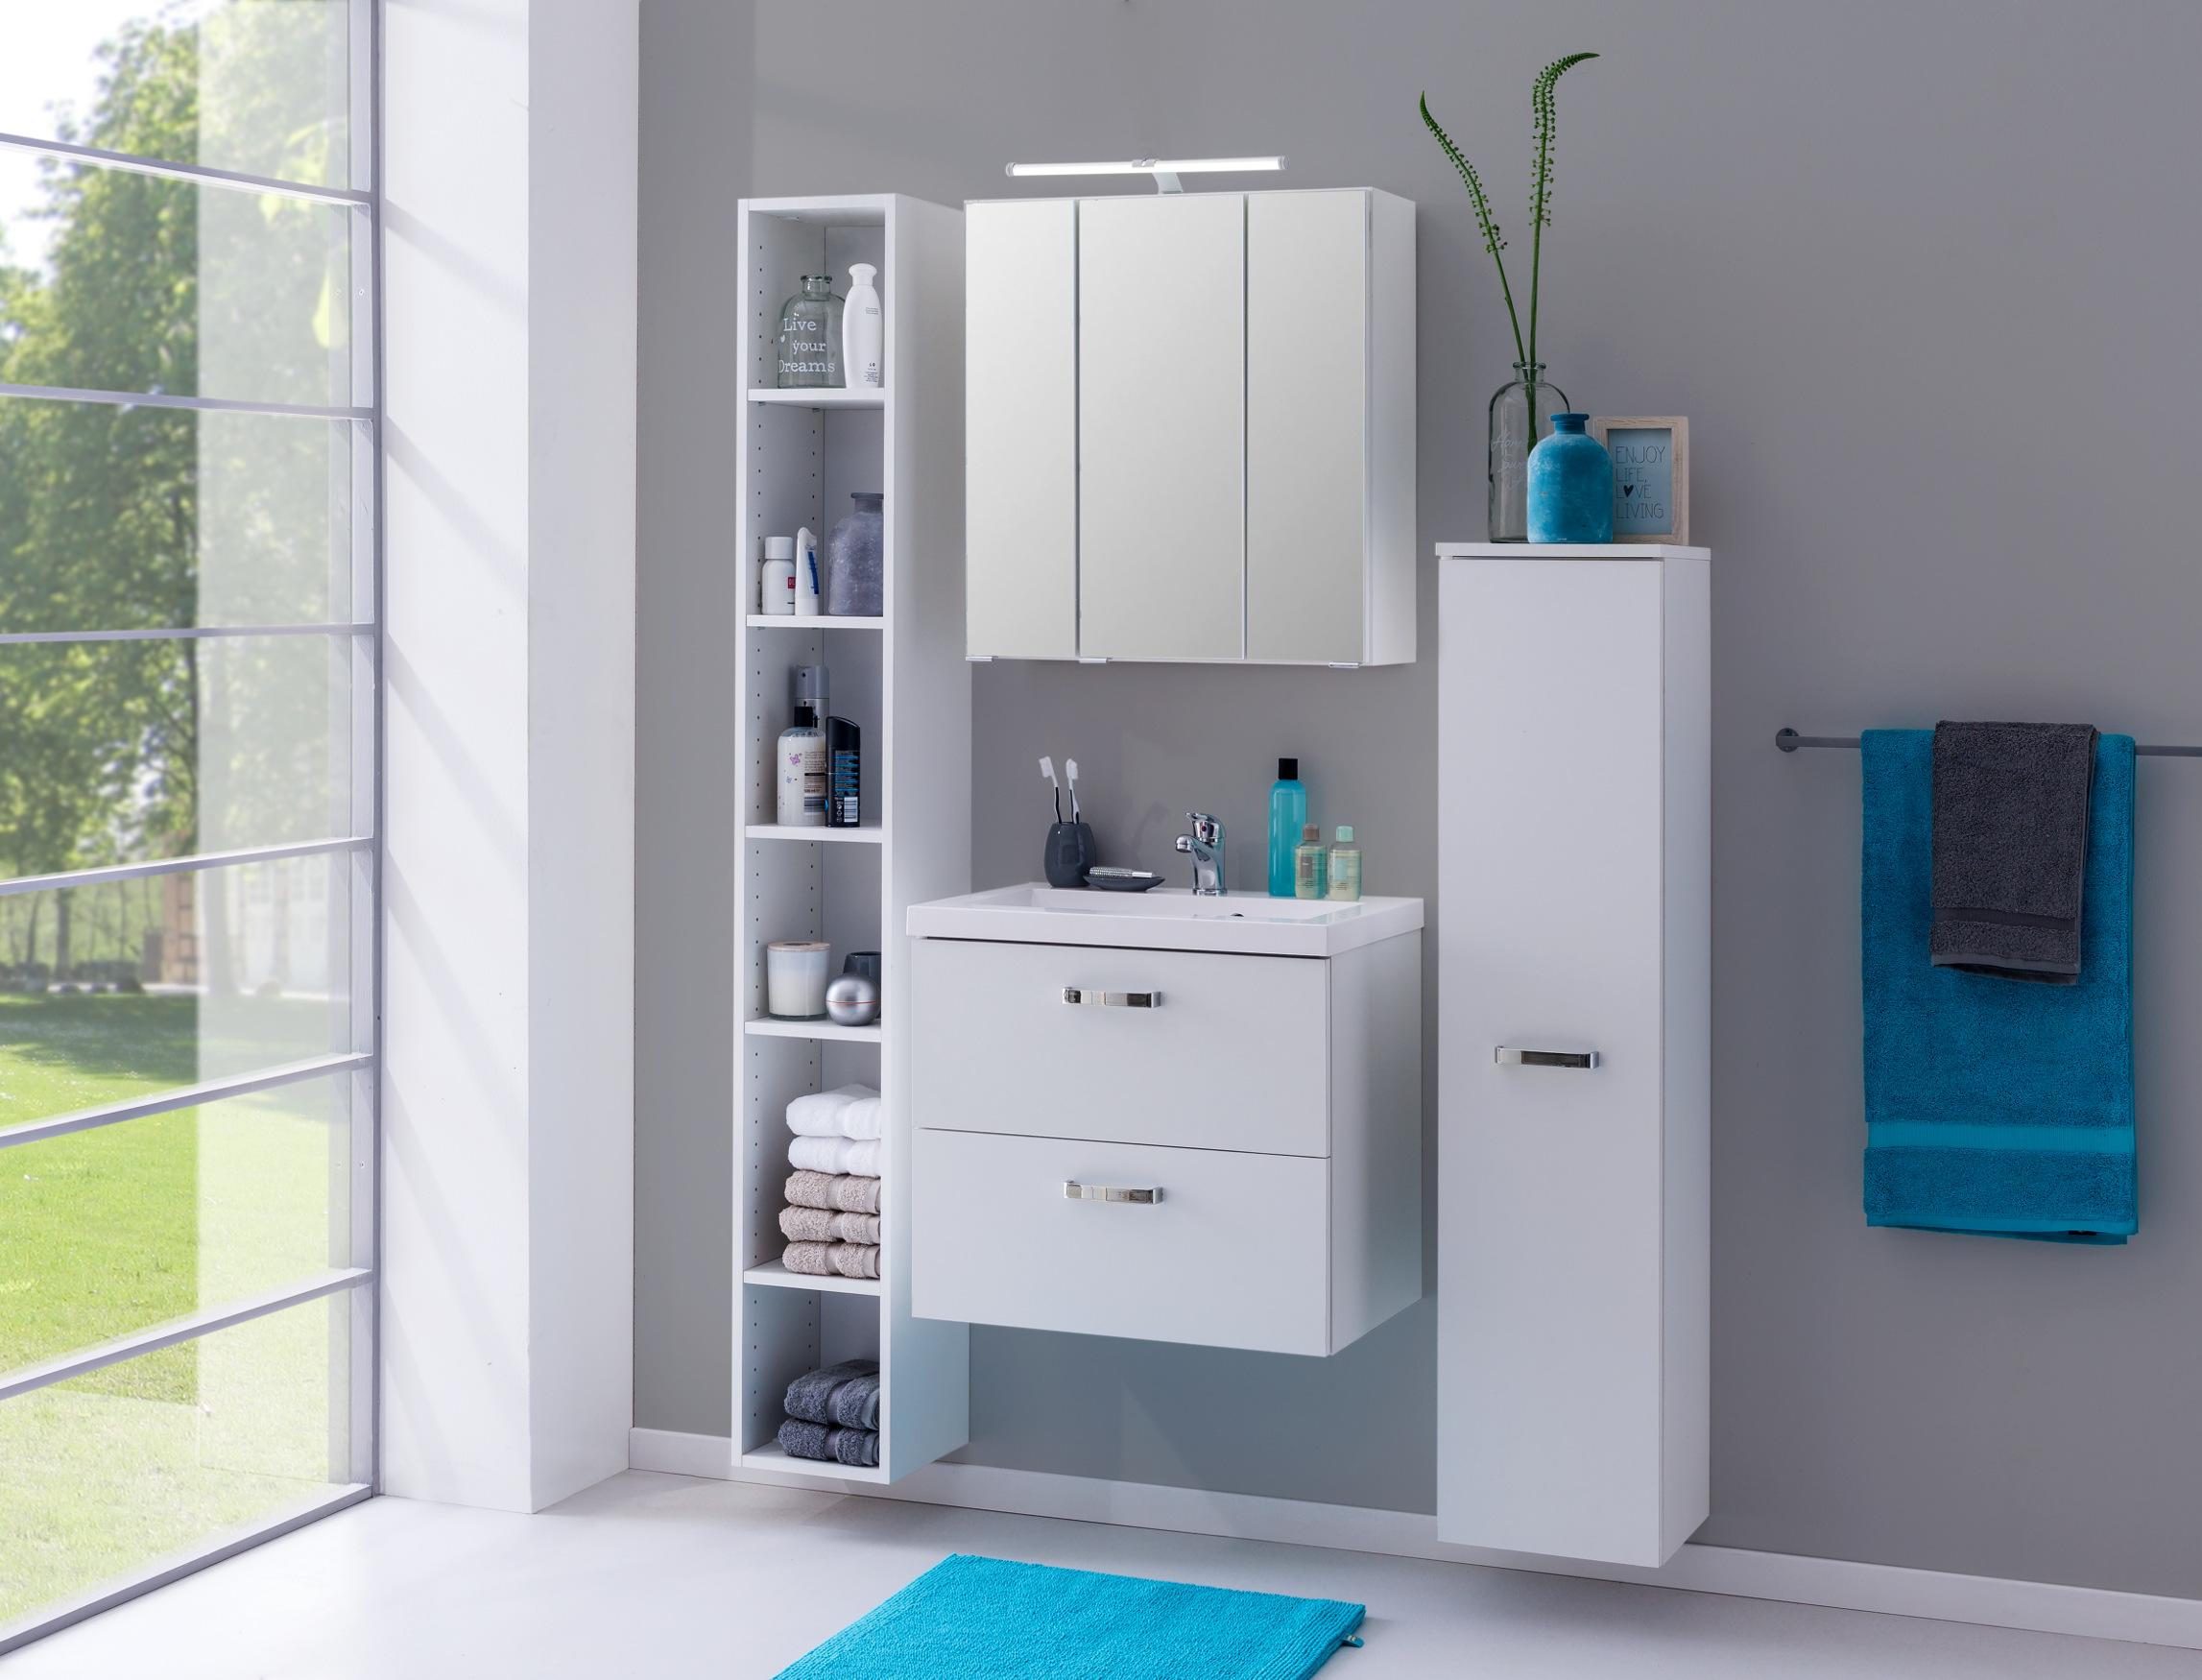 regal montreal badezimmer h ngeregal badregal mit 6 f chern 25 cm weiss ebay. Black Bedroom Furniture Sets. Home Design Ideas